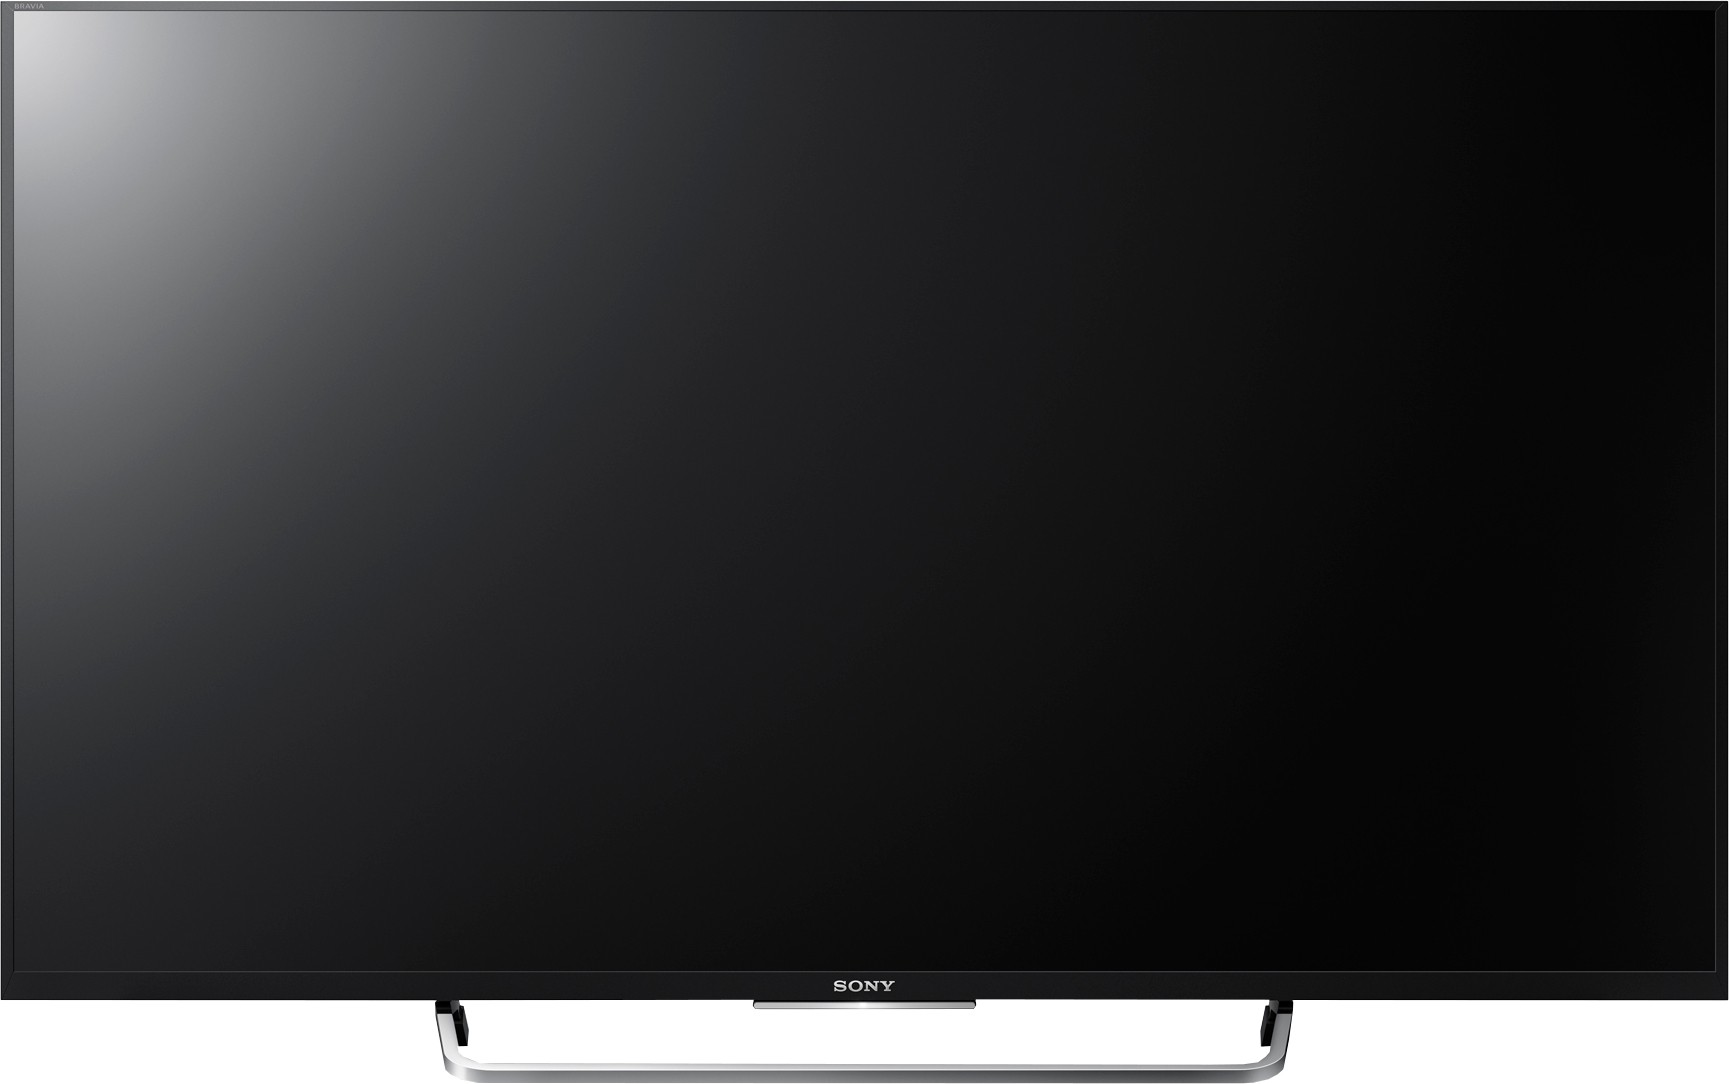 SONY KDL 43W800D 43 Inches Full HD LED TV